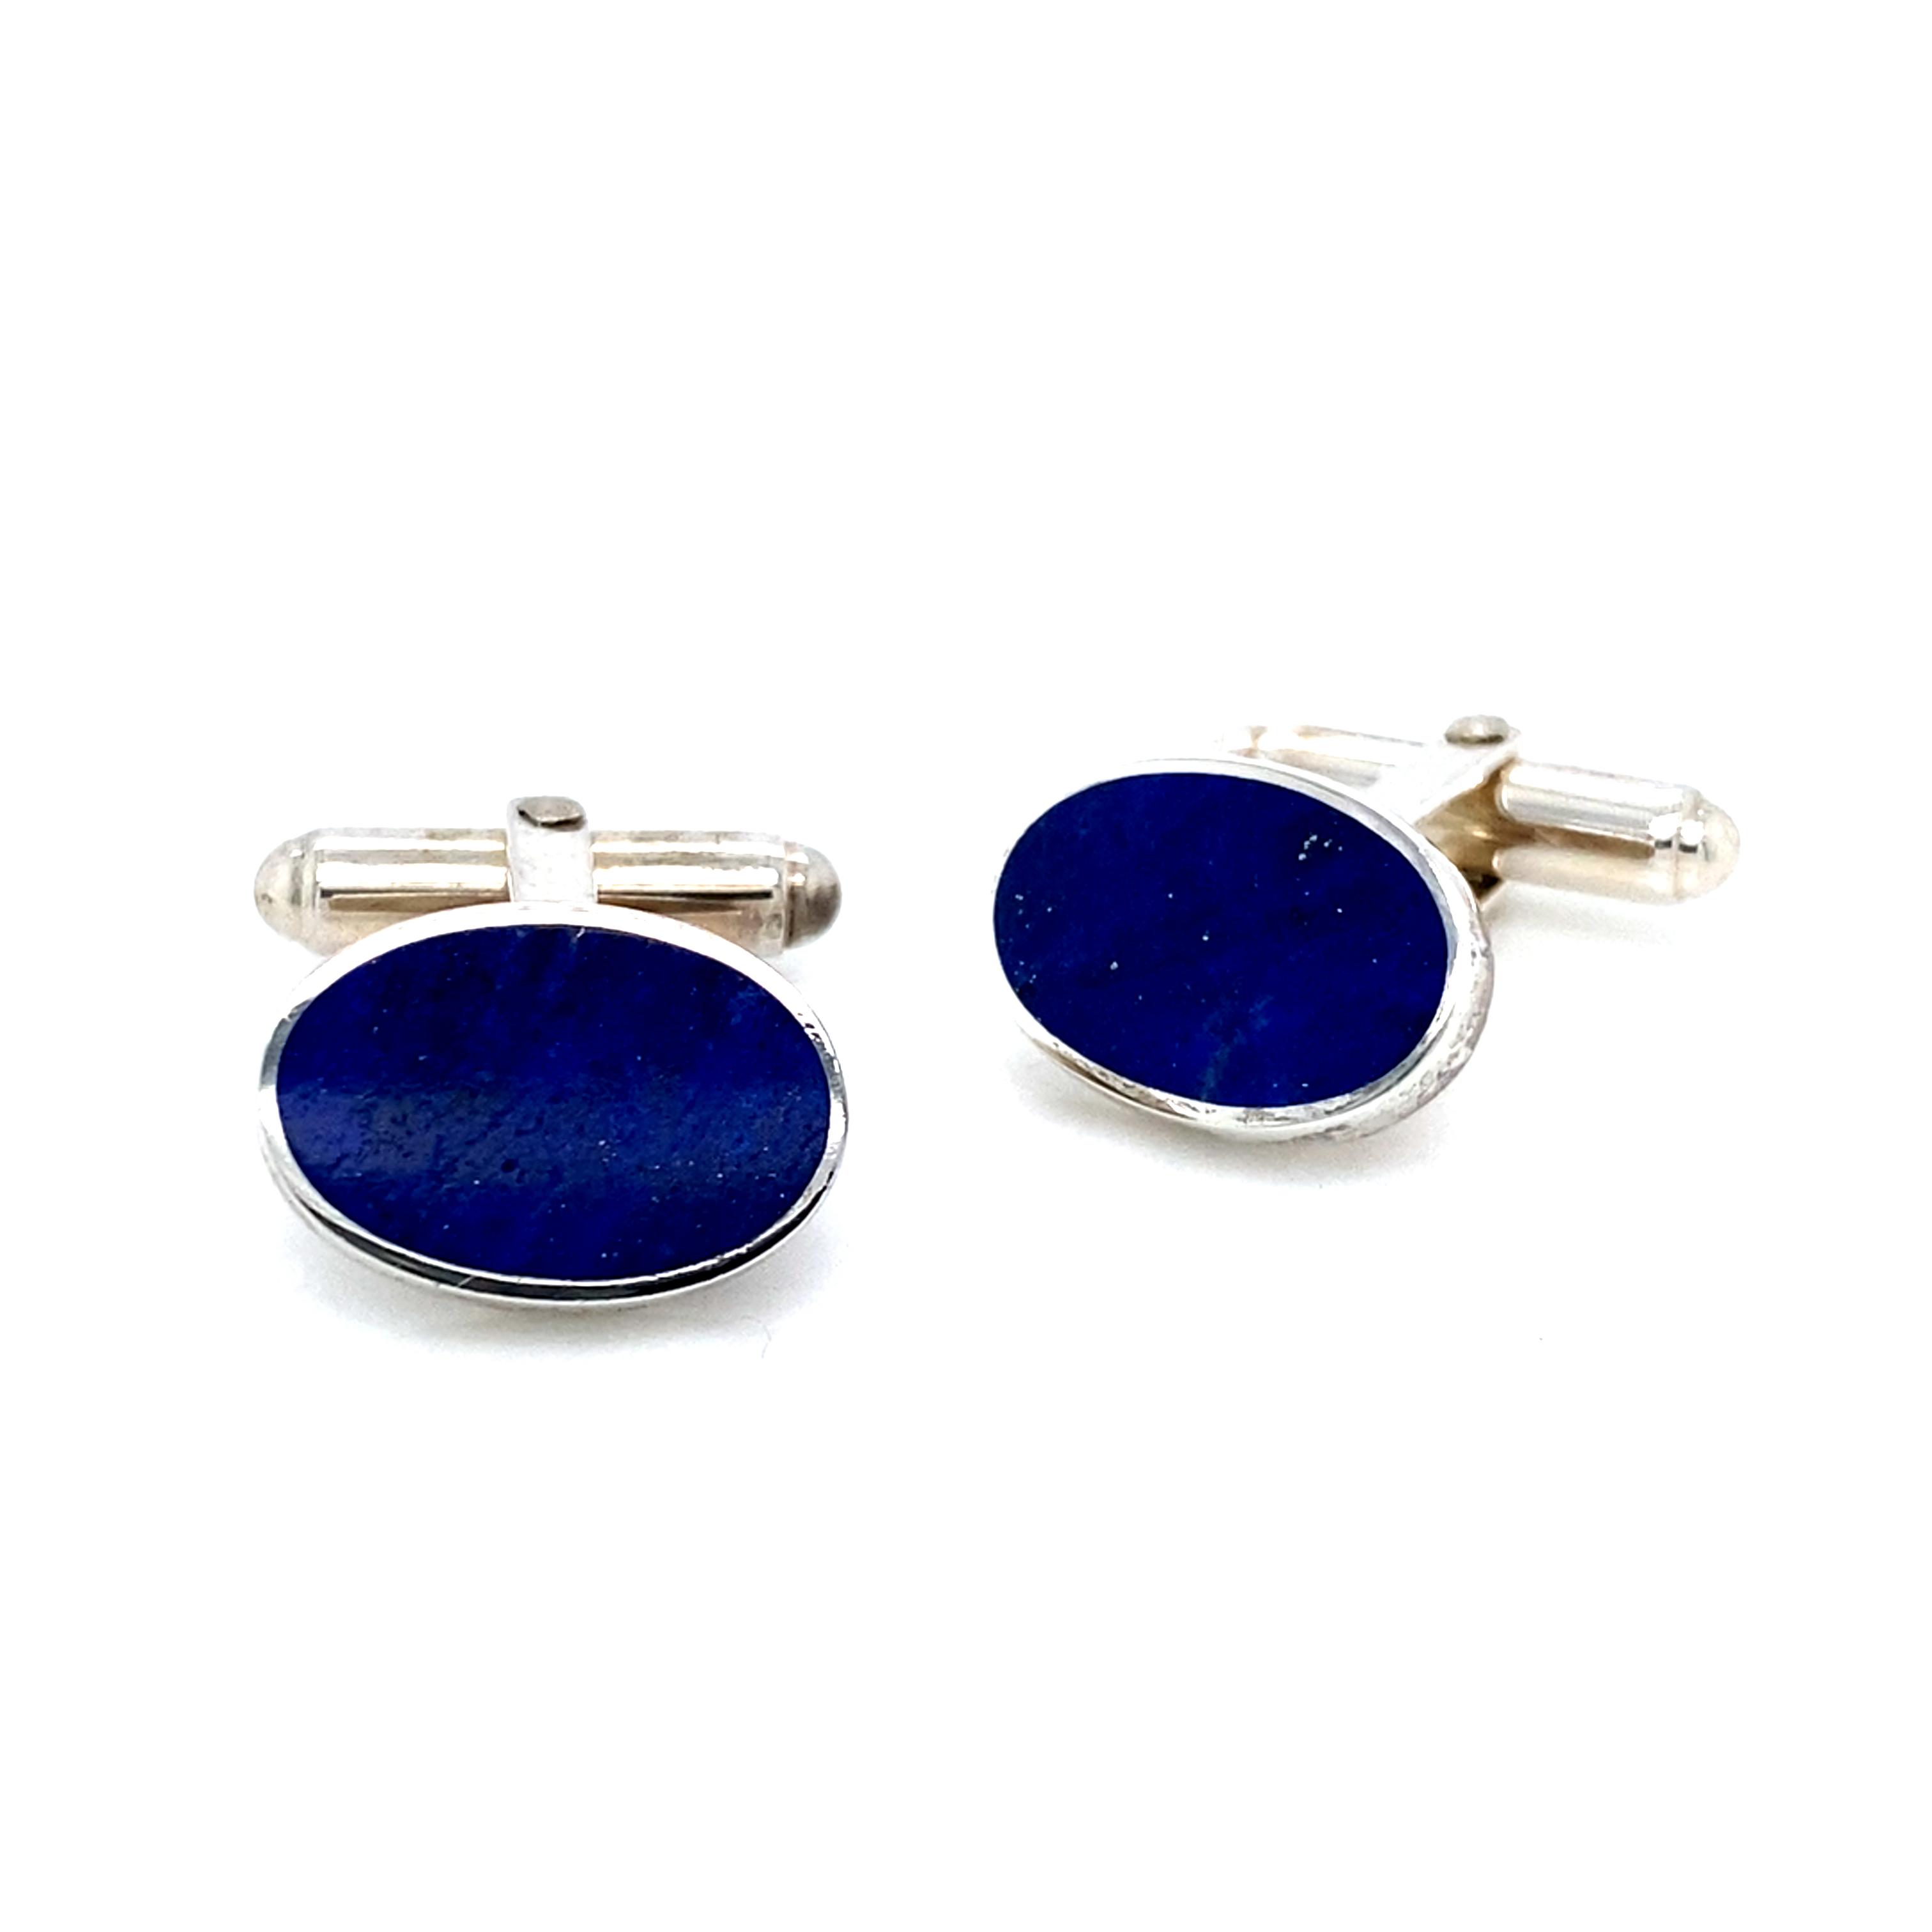 Sterling Silver Lapis Lazuli Oval Cufflinks